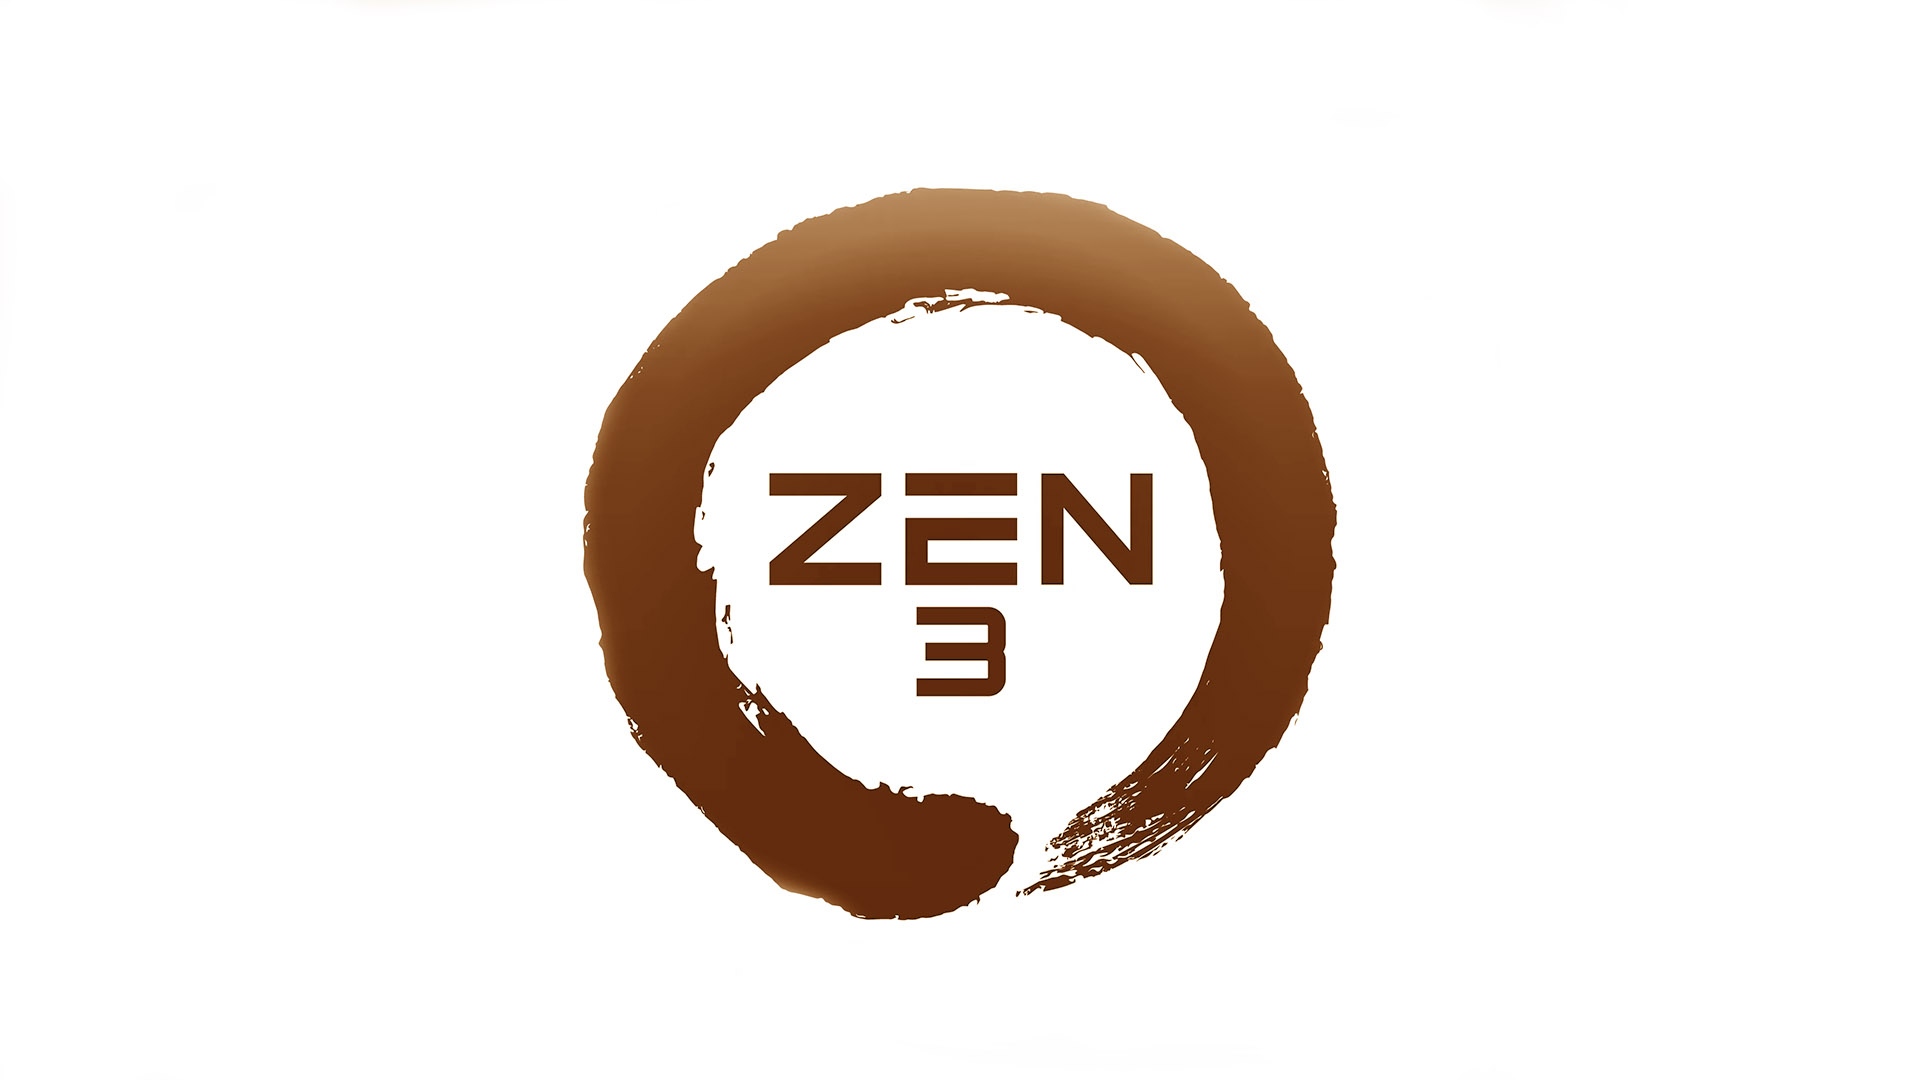 Amd Will Showcase Its Zen 3 Cpus And Big Navi Gpus Next Month Pcgamesn